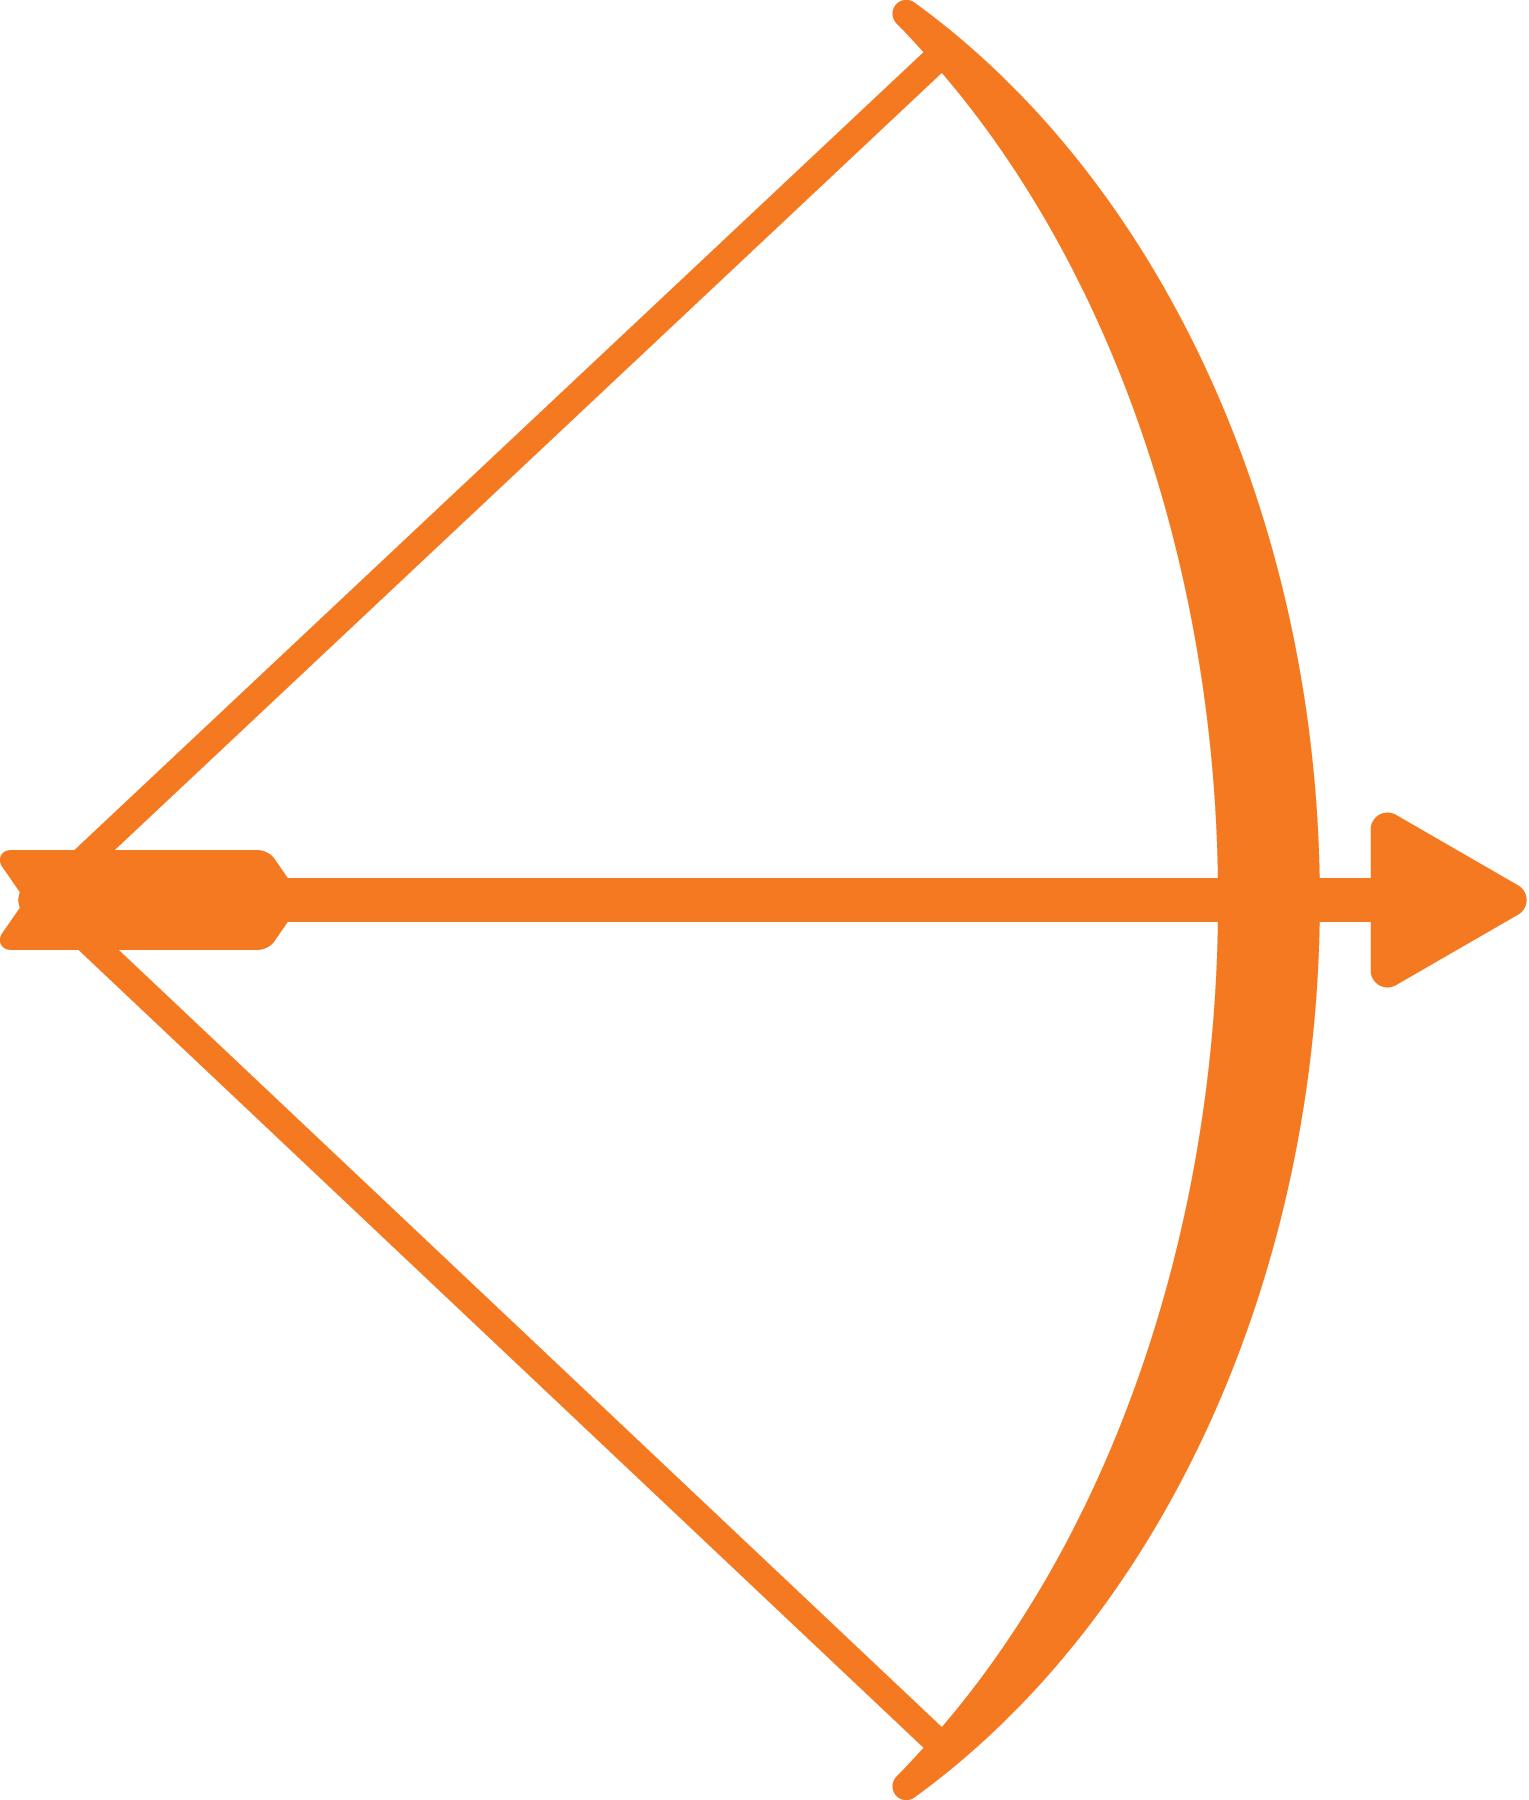 Bows clipart archery. Northwest family ymca